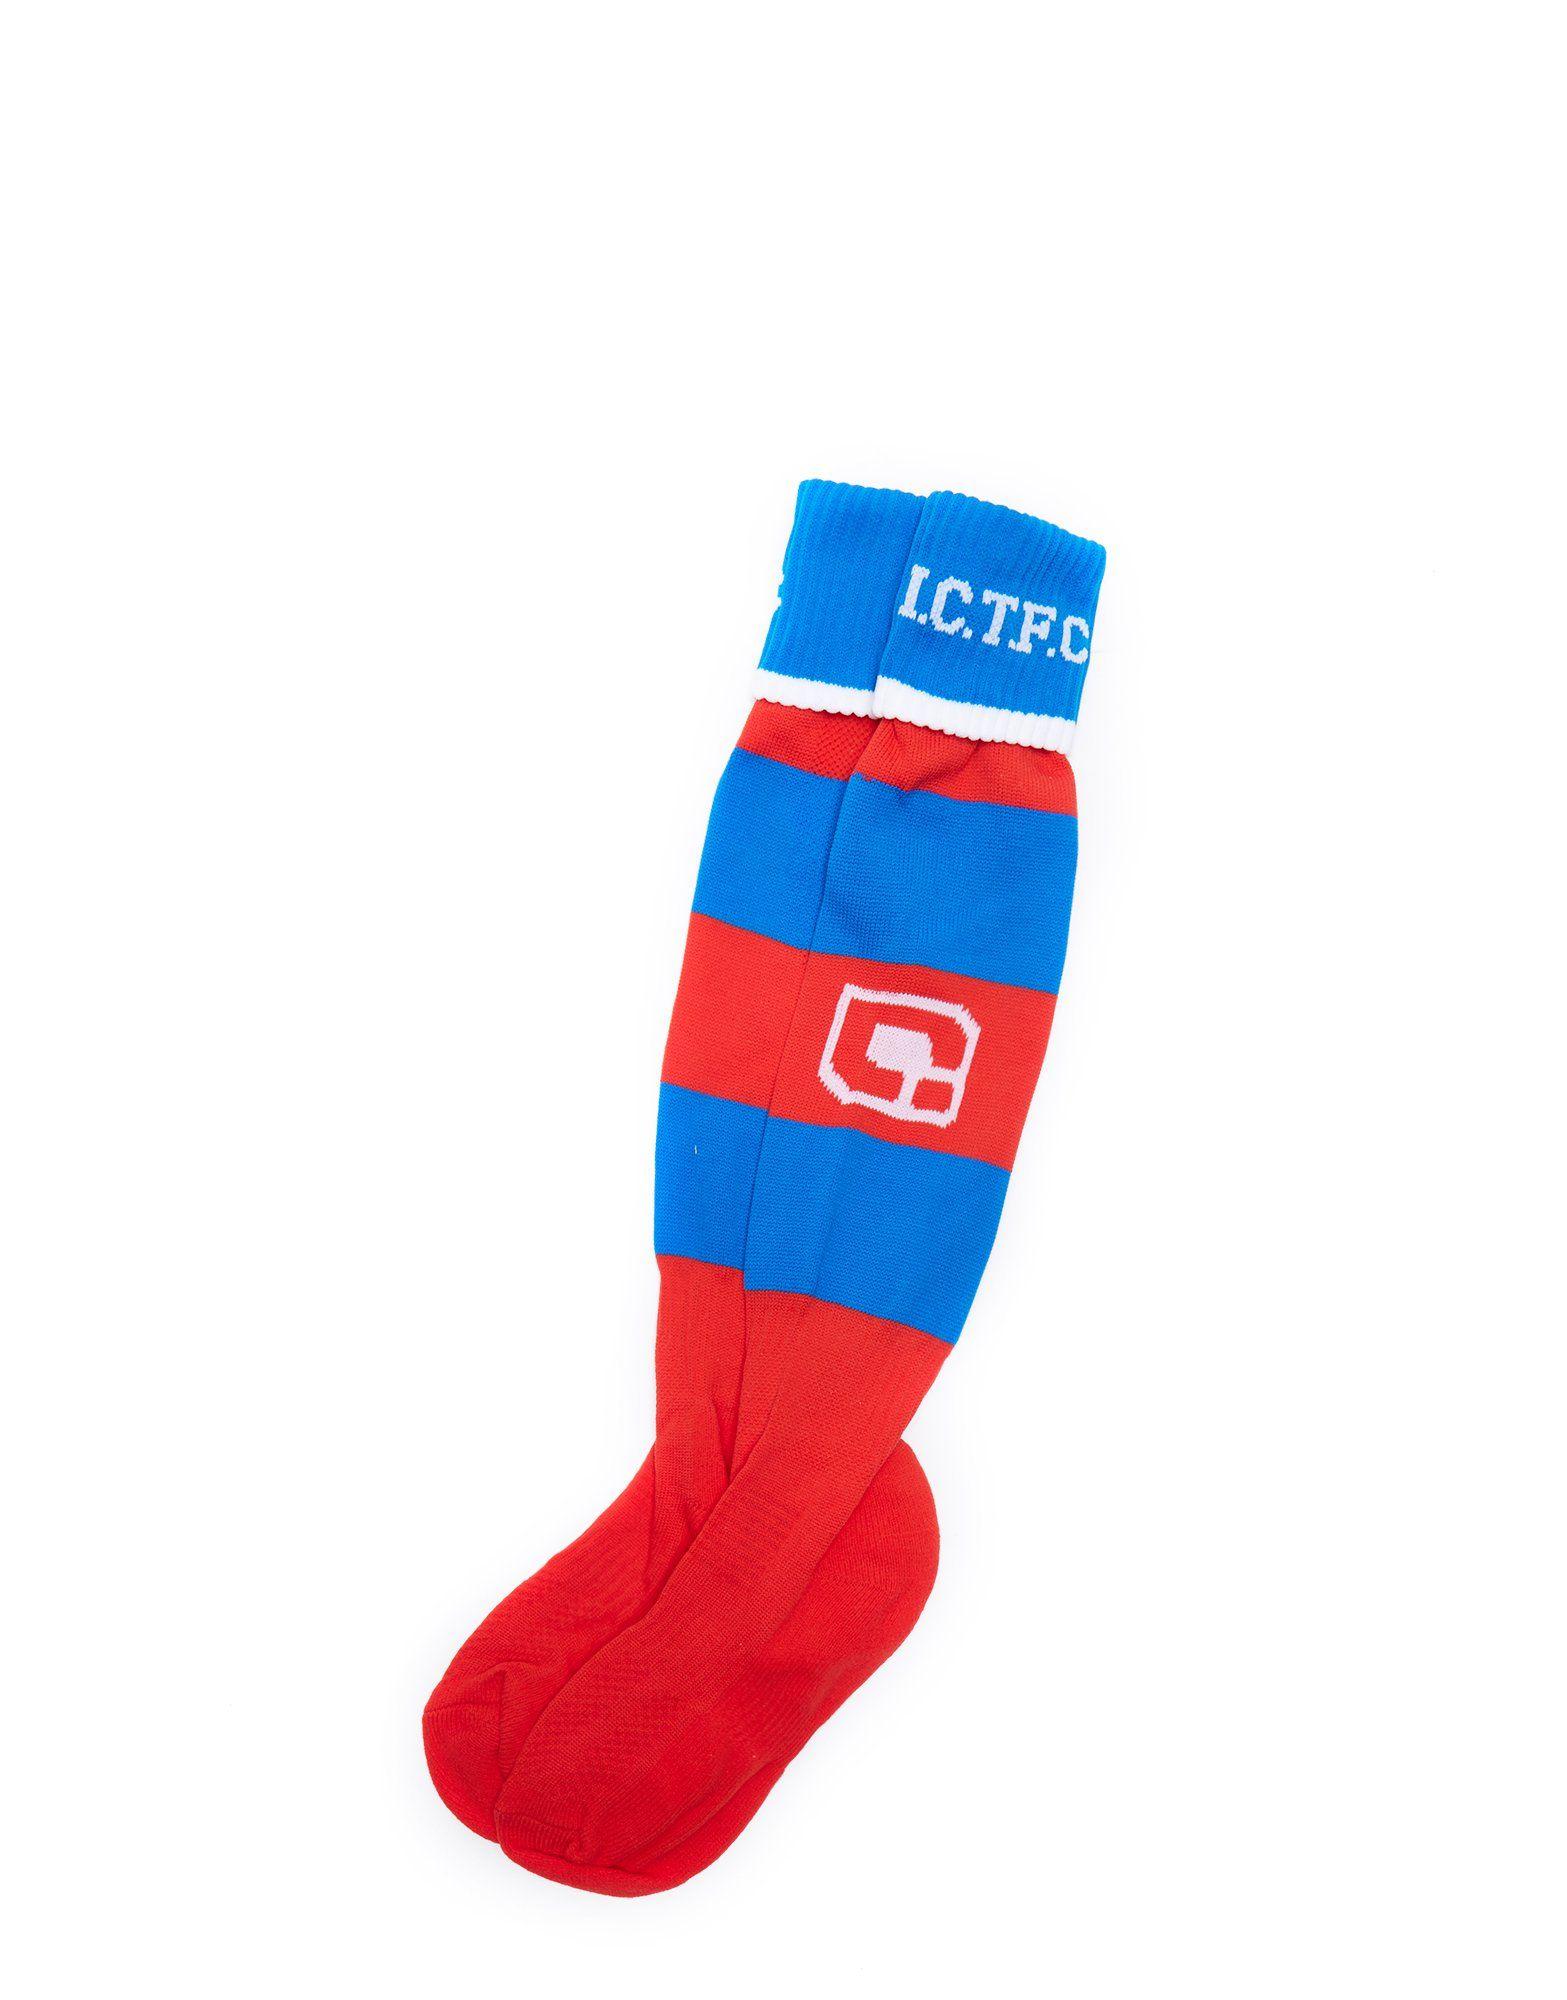 Carbrini Inverness CT 2016/17 Home Socks Junior